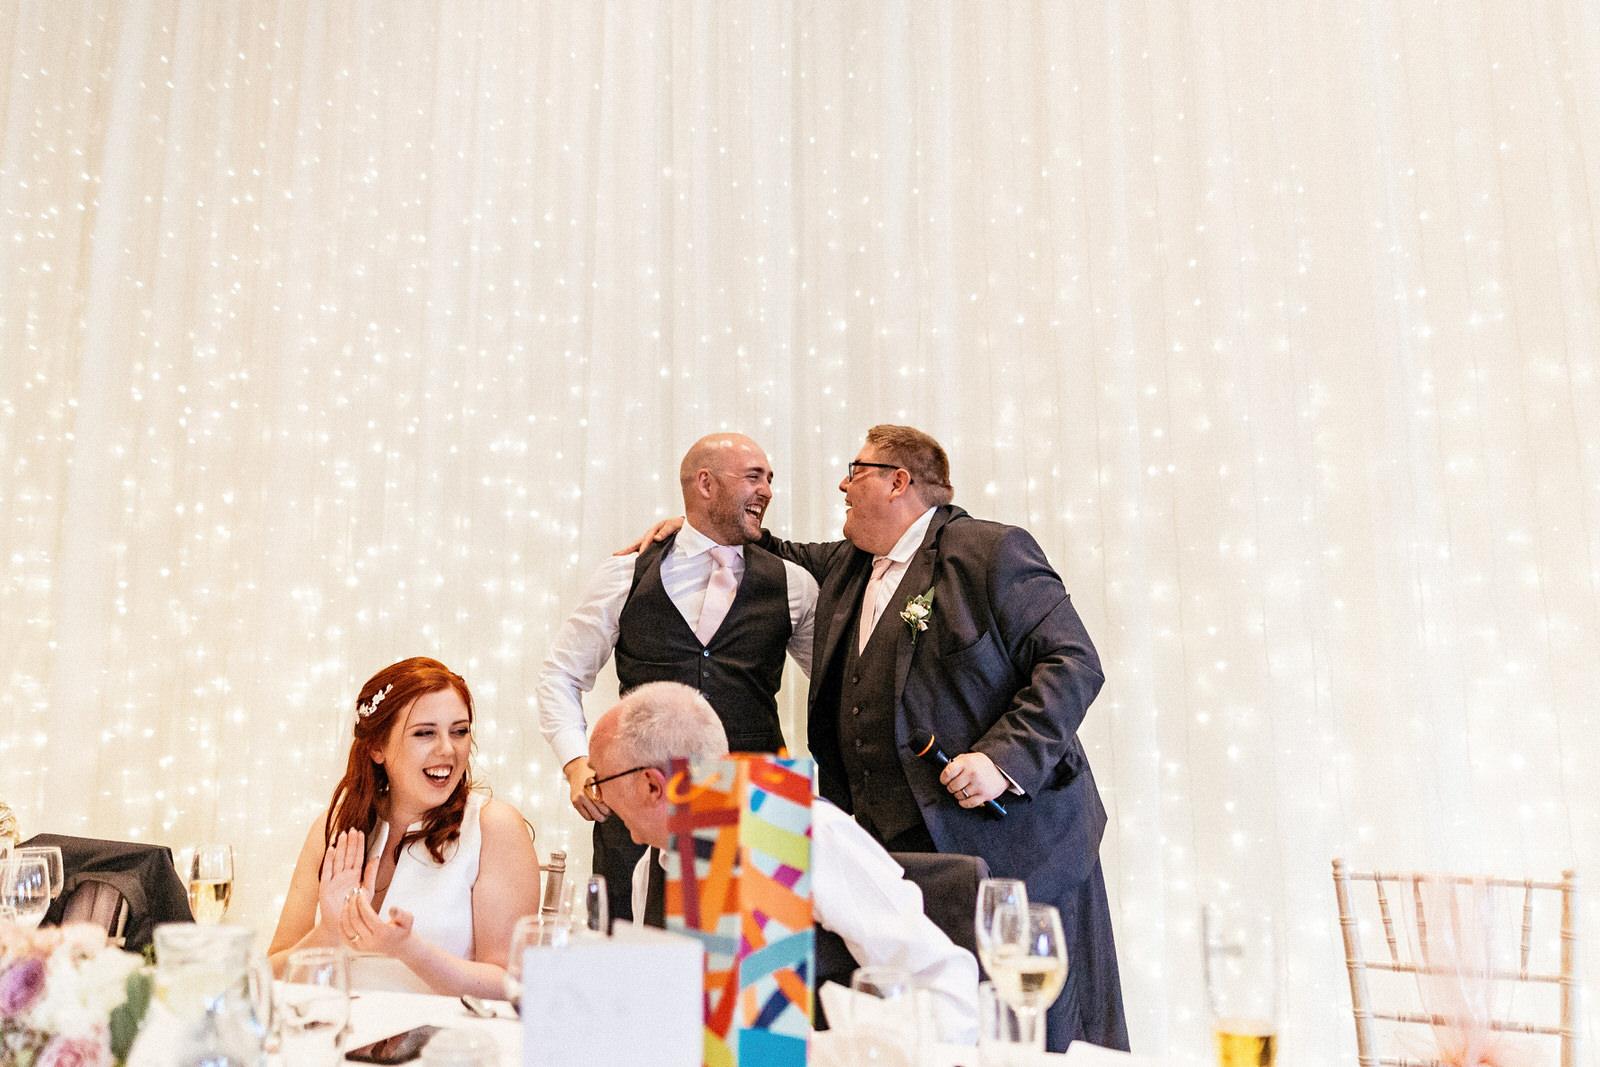 Beamish-Hall-Wedding-Photographer-058.jpg